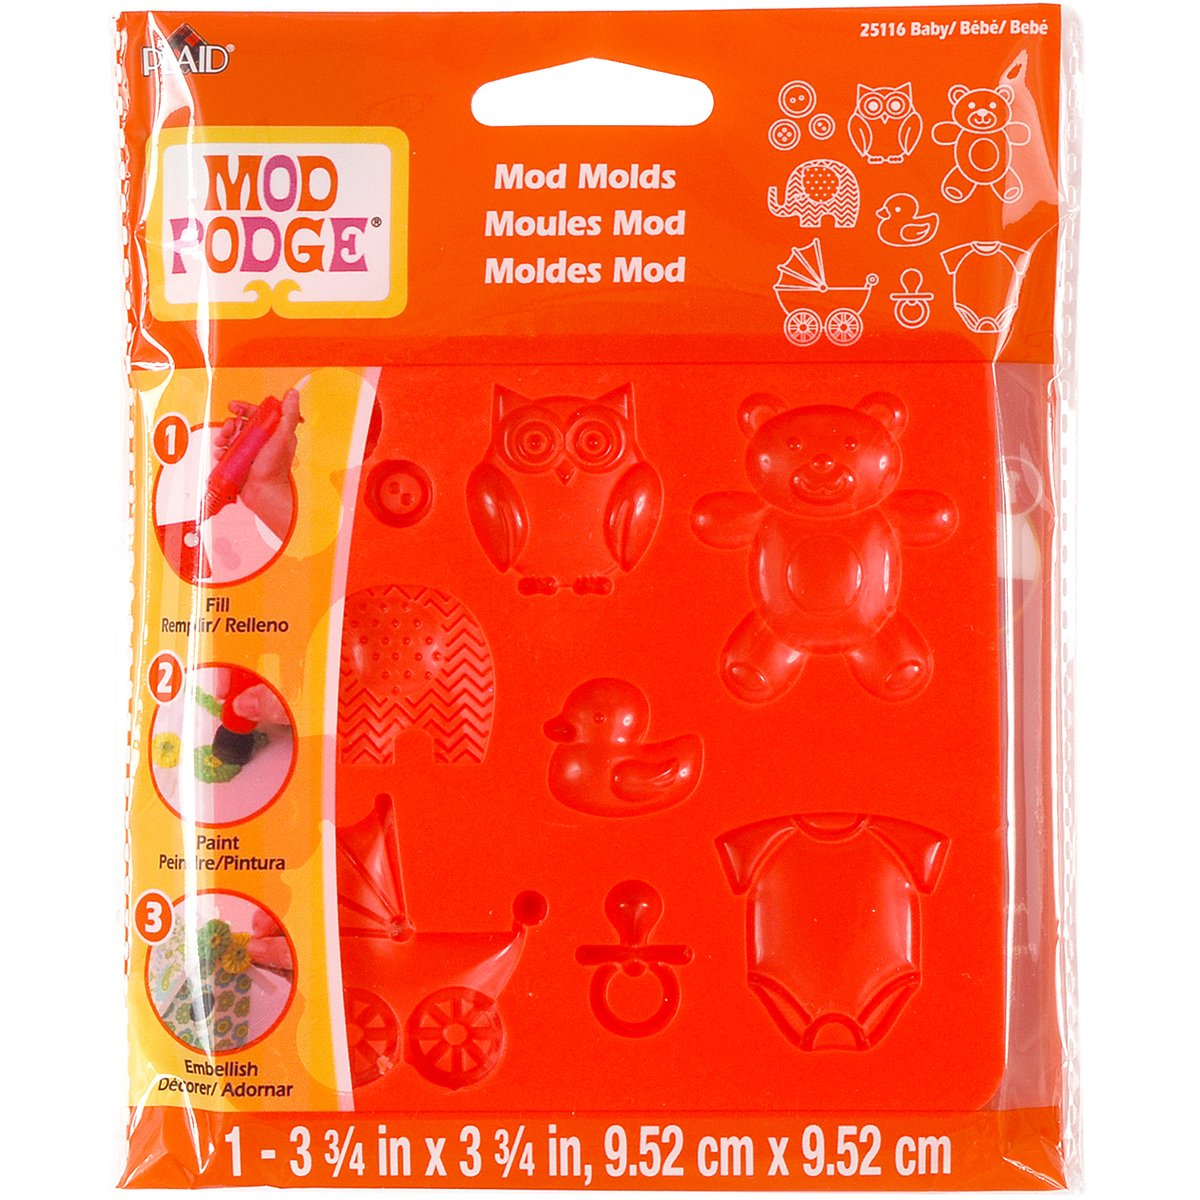 Mod Podge Mod Mold (3-3/4 by 3-3/4-Inch), 25116